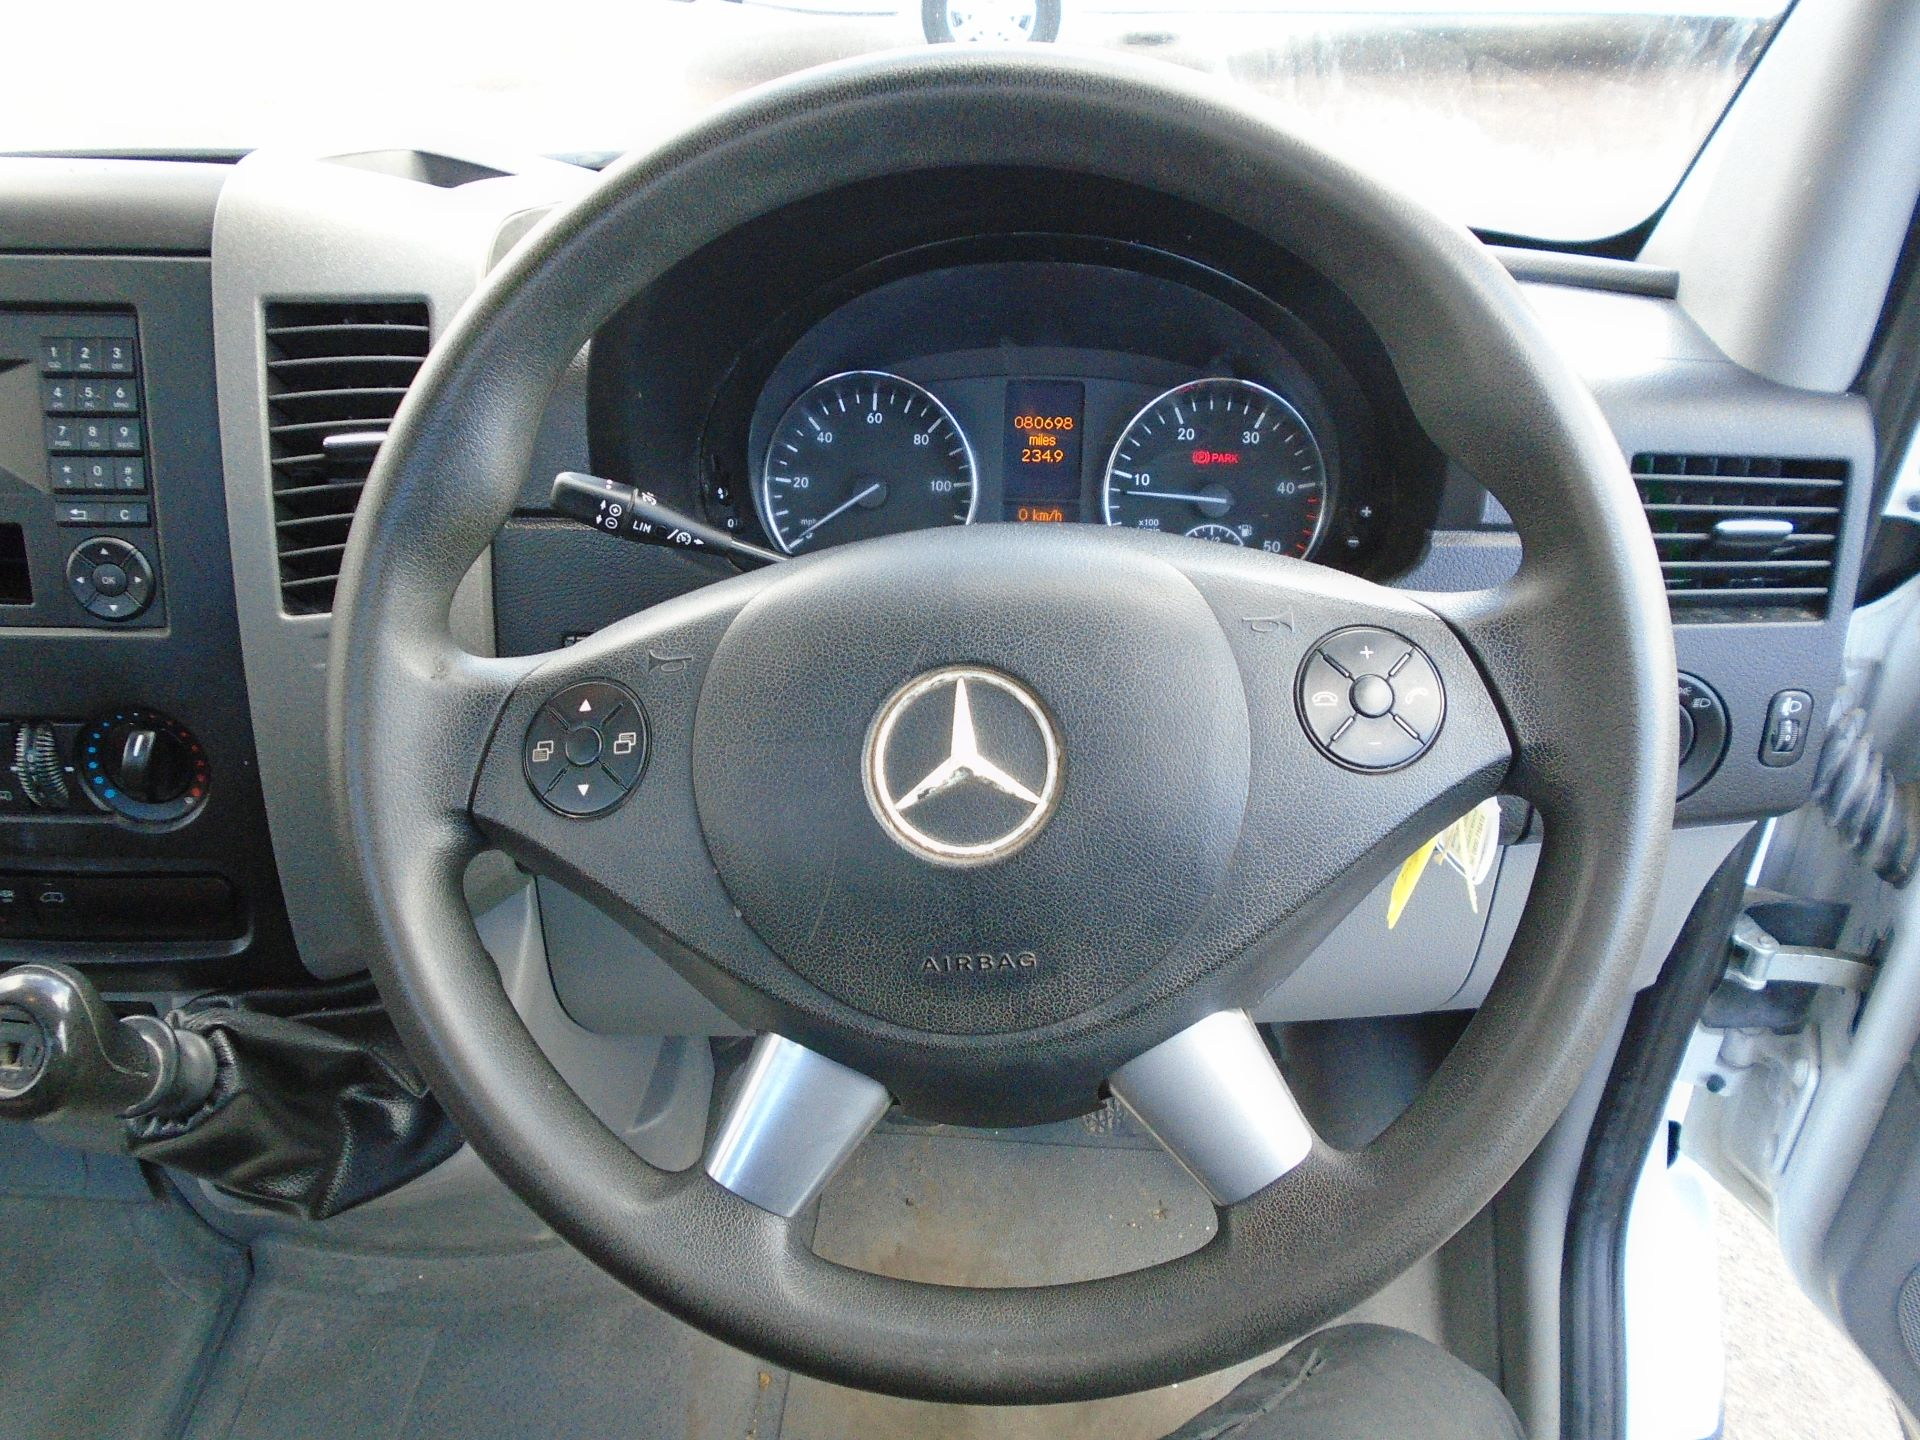 2017 Mercedes-Benz Sprinter 3.5T Blue Efficiency Dropside (KN17NZO) Image 12